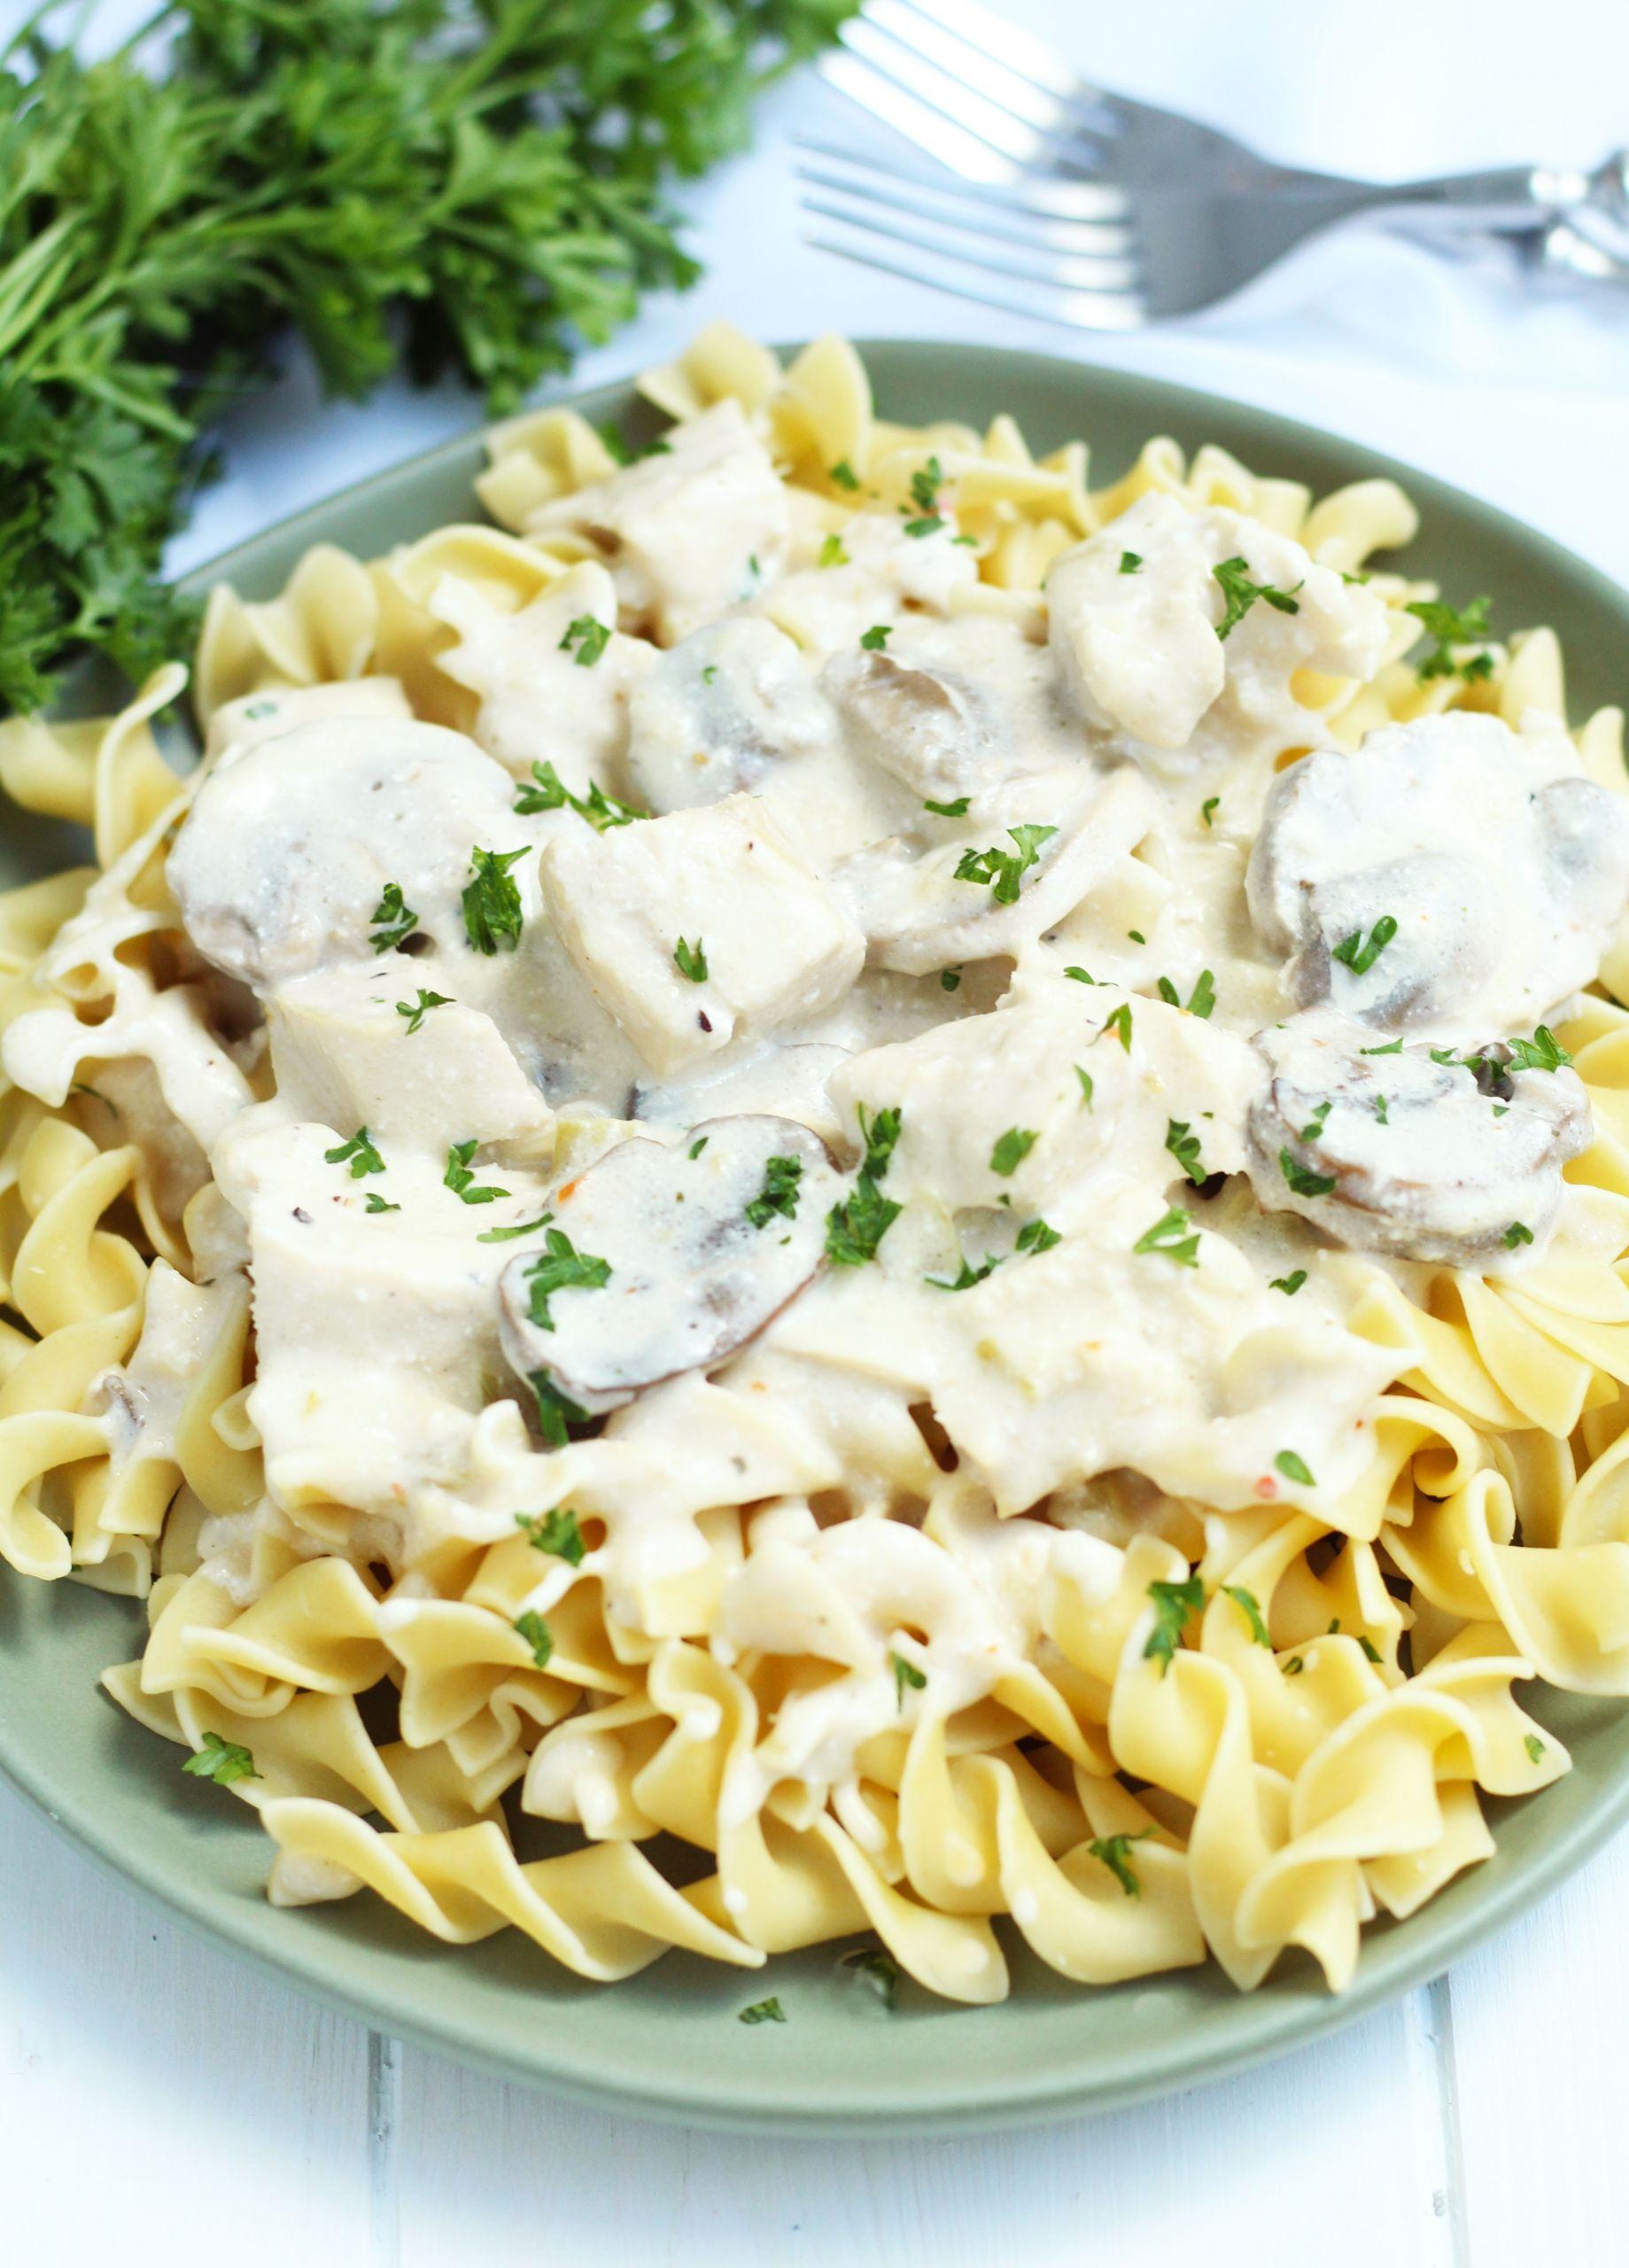 Crockpot Chicken Recipes With Cream Of Mushroom Soup  Crockpot Chicken Stroganoff 3 Yummy Tummies